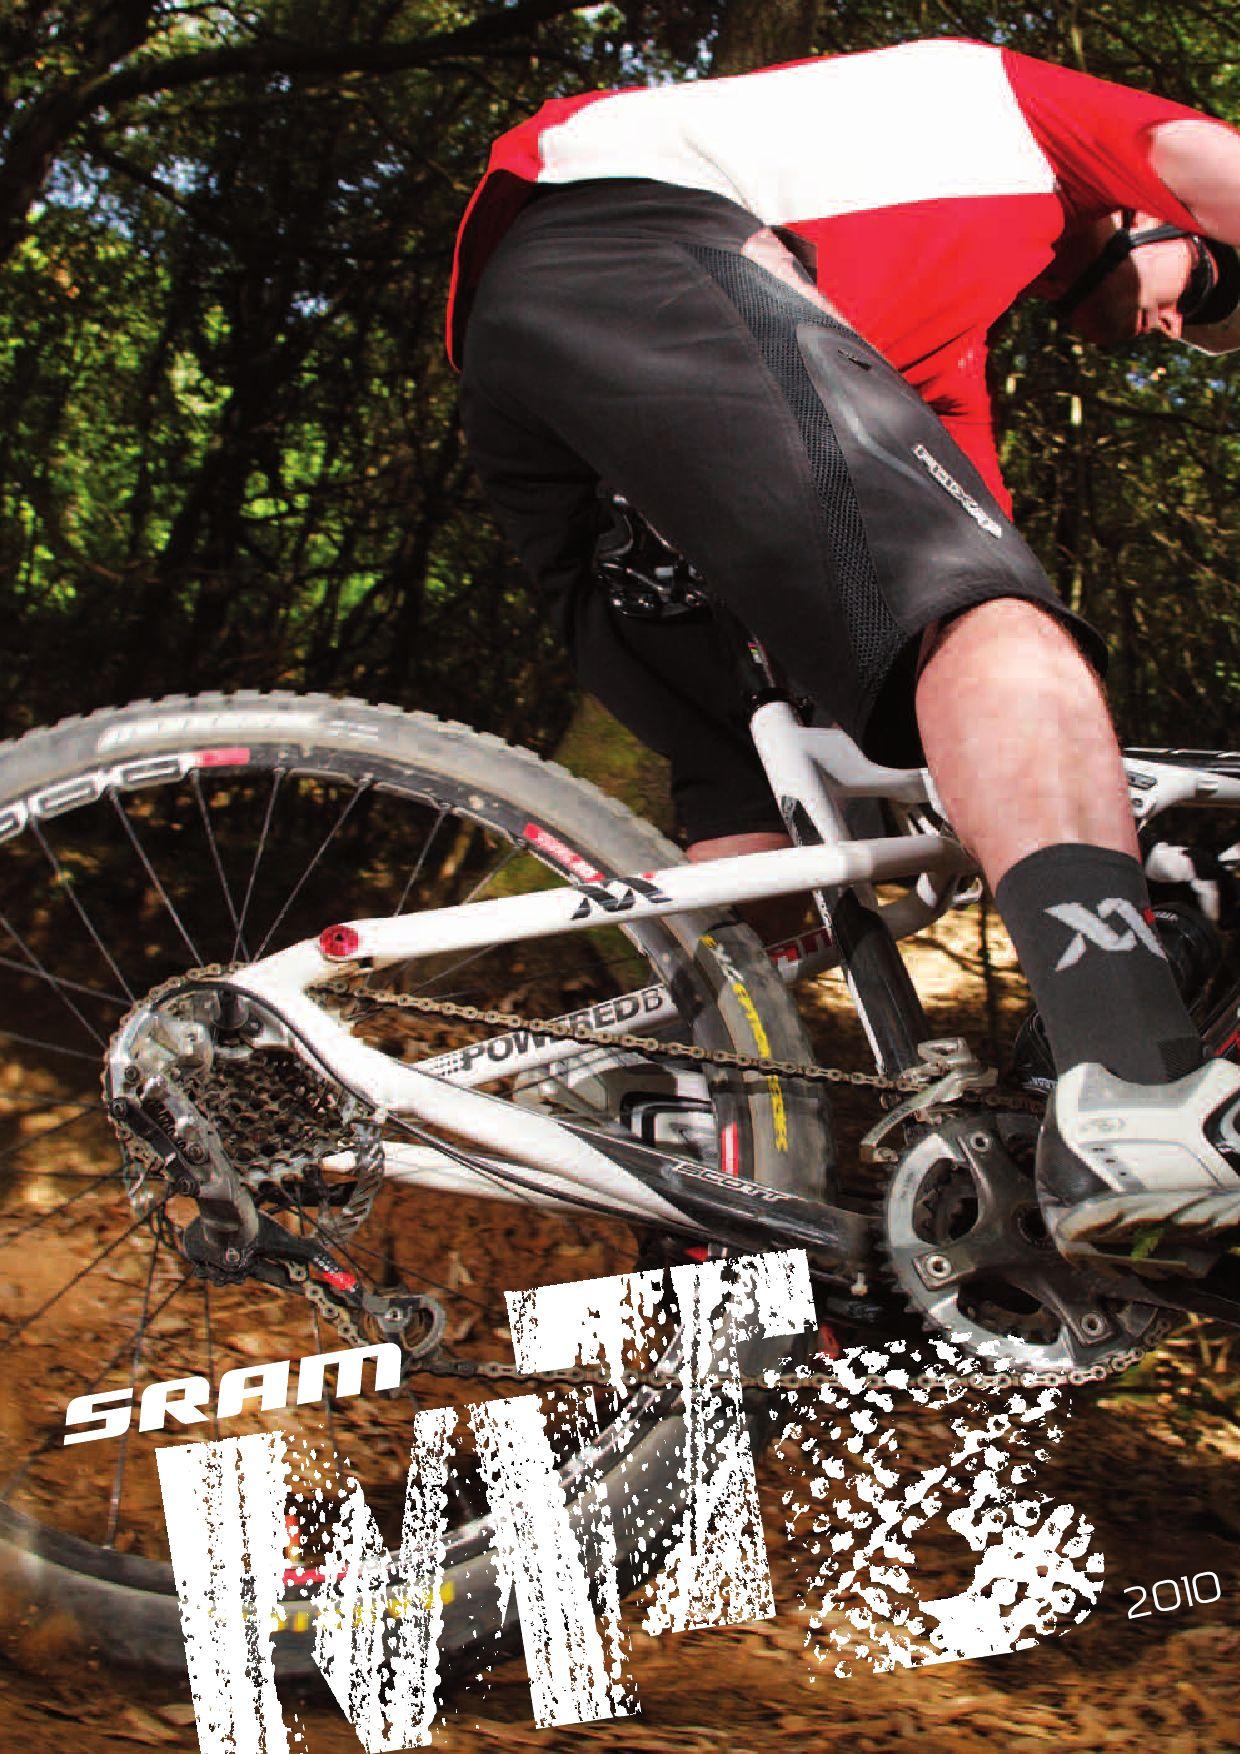 Fahrrad Schalt Werk Sram X5 10 Gang langer Käfig Alu schwarz